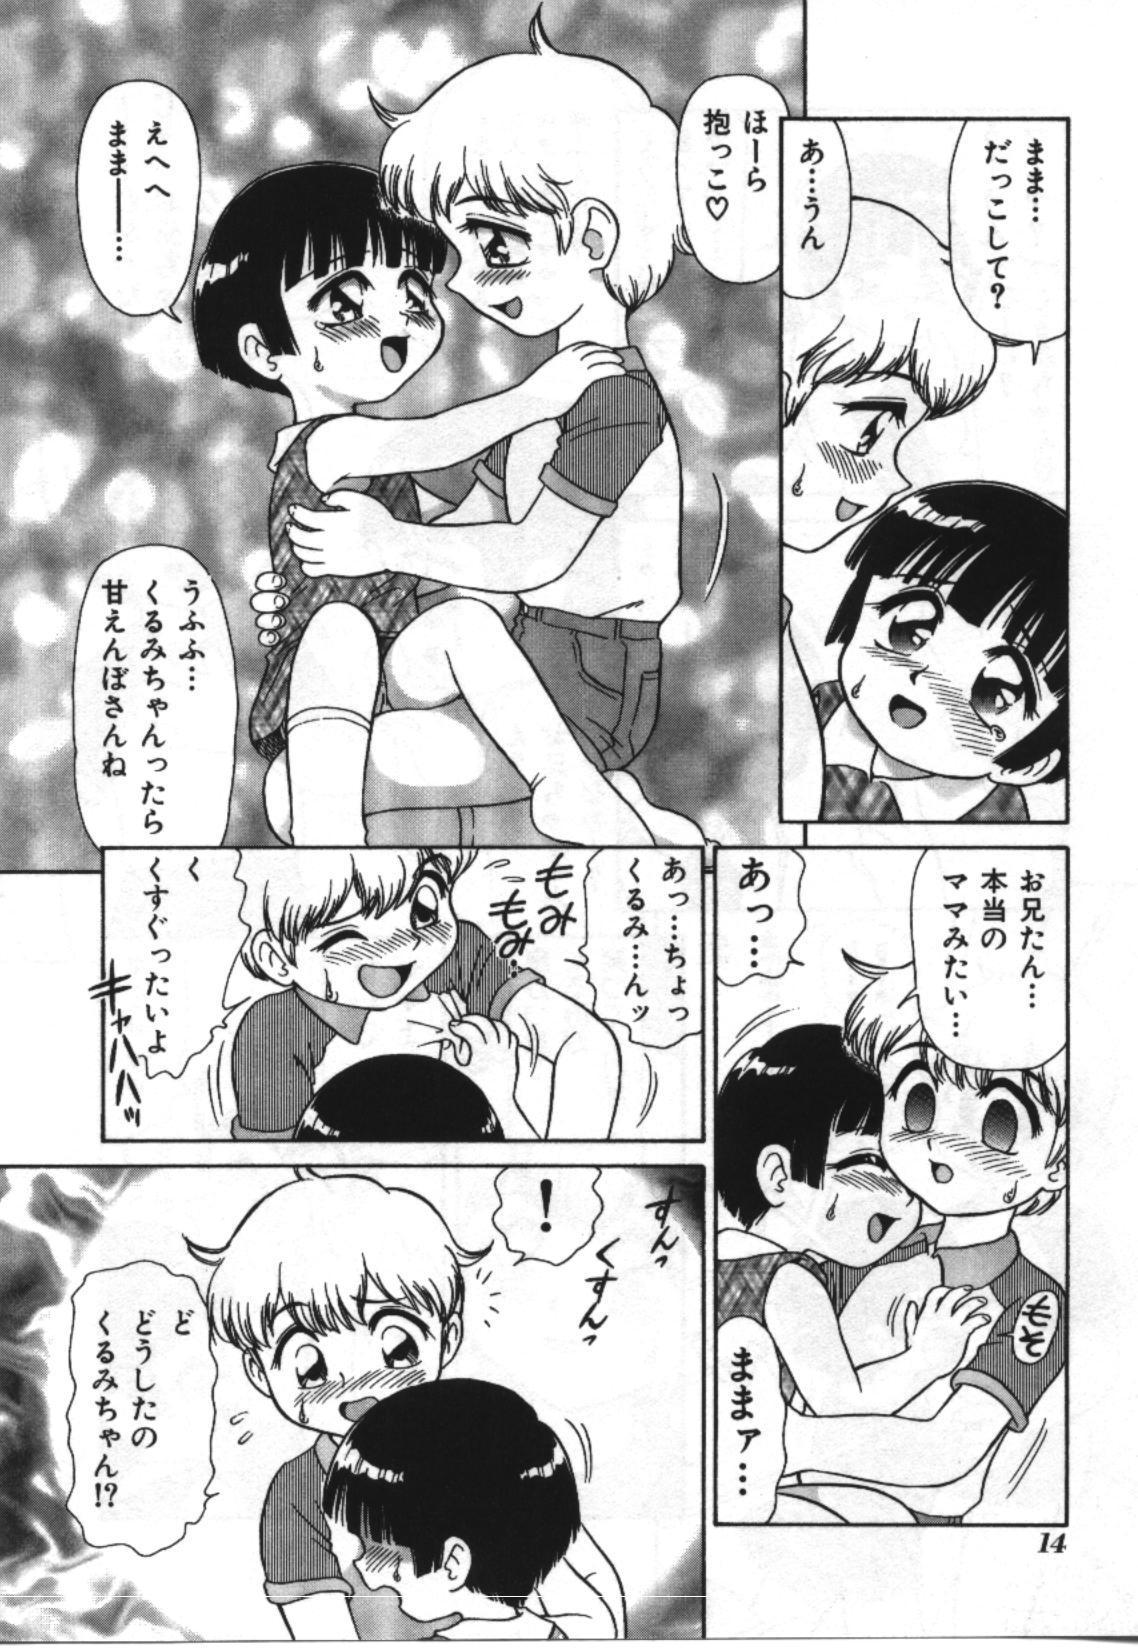 Imouto Koishi 2 13